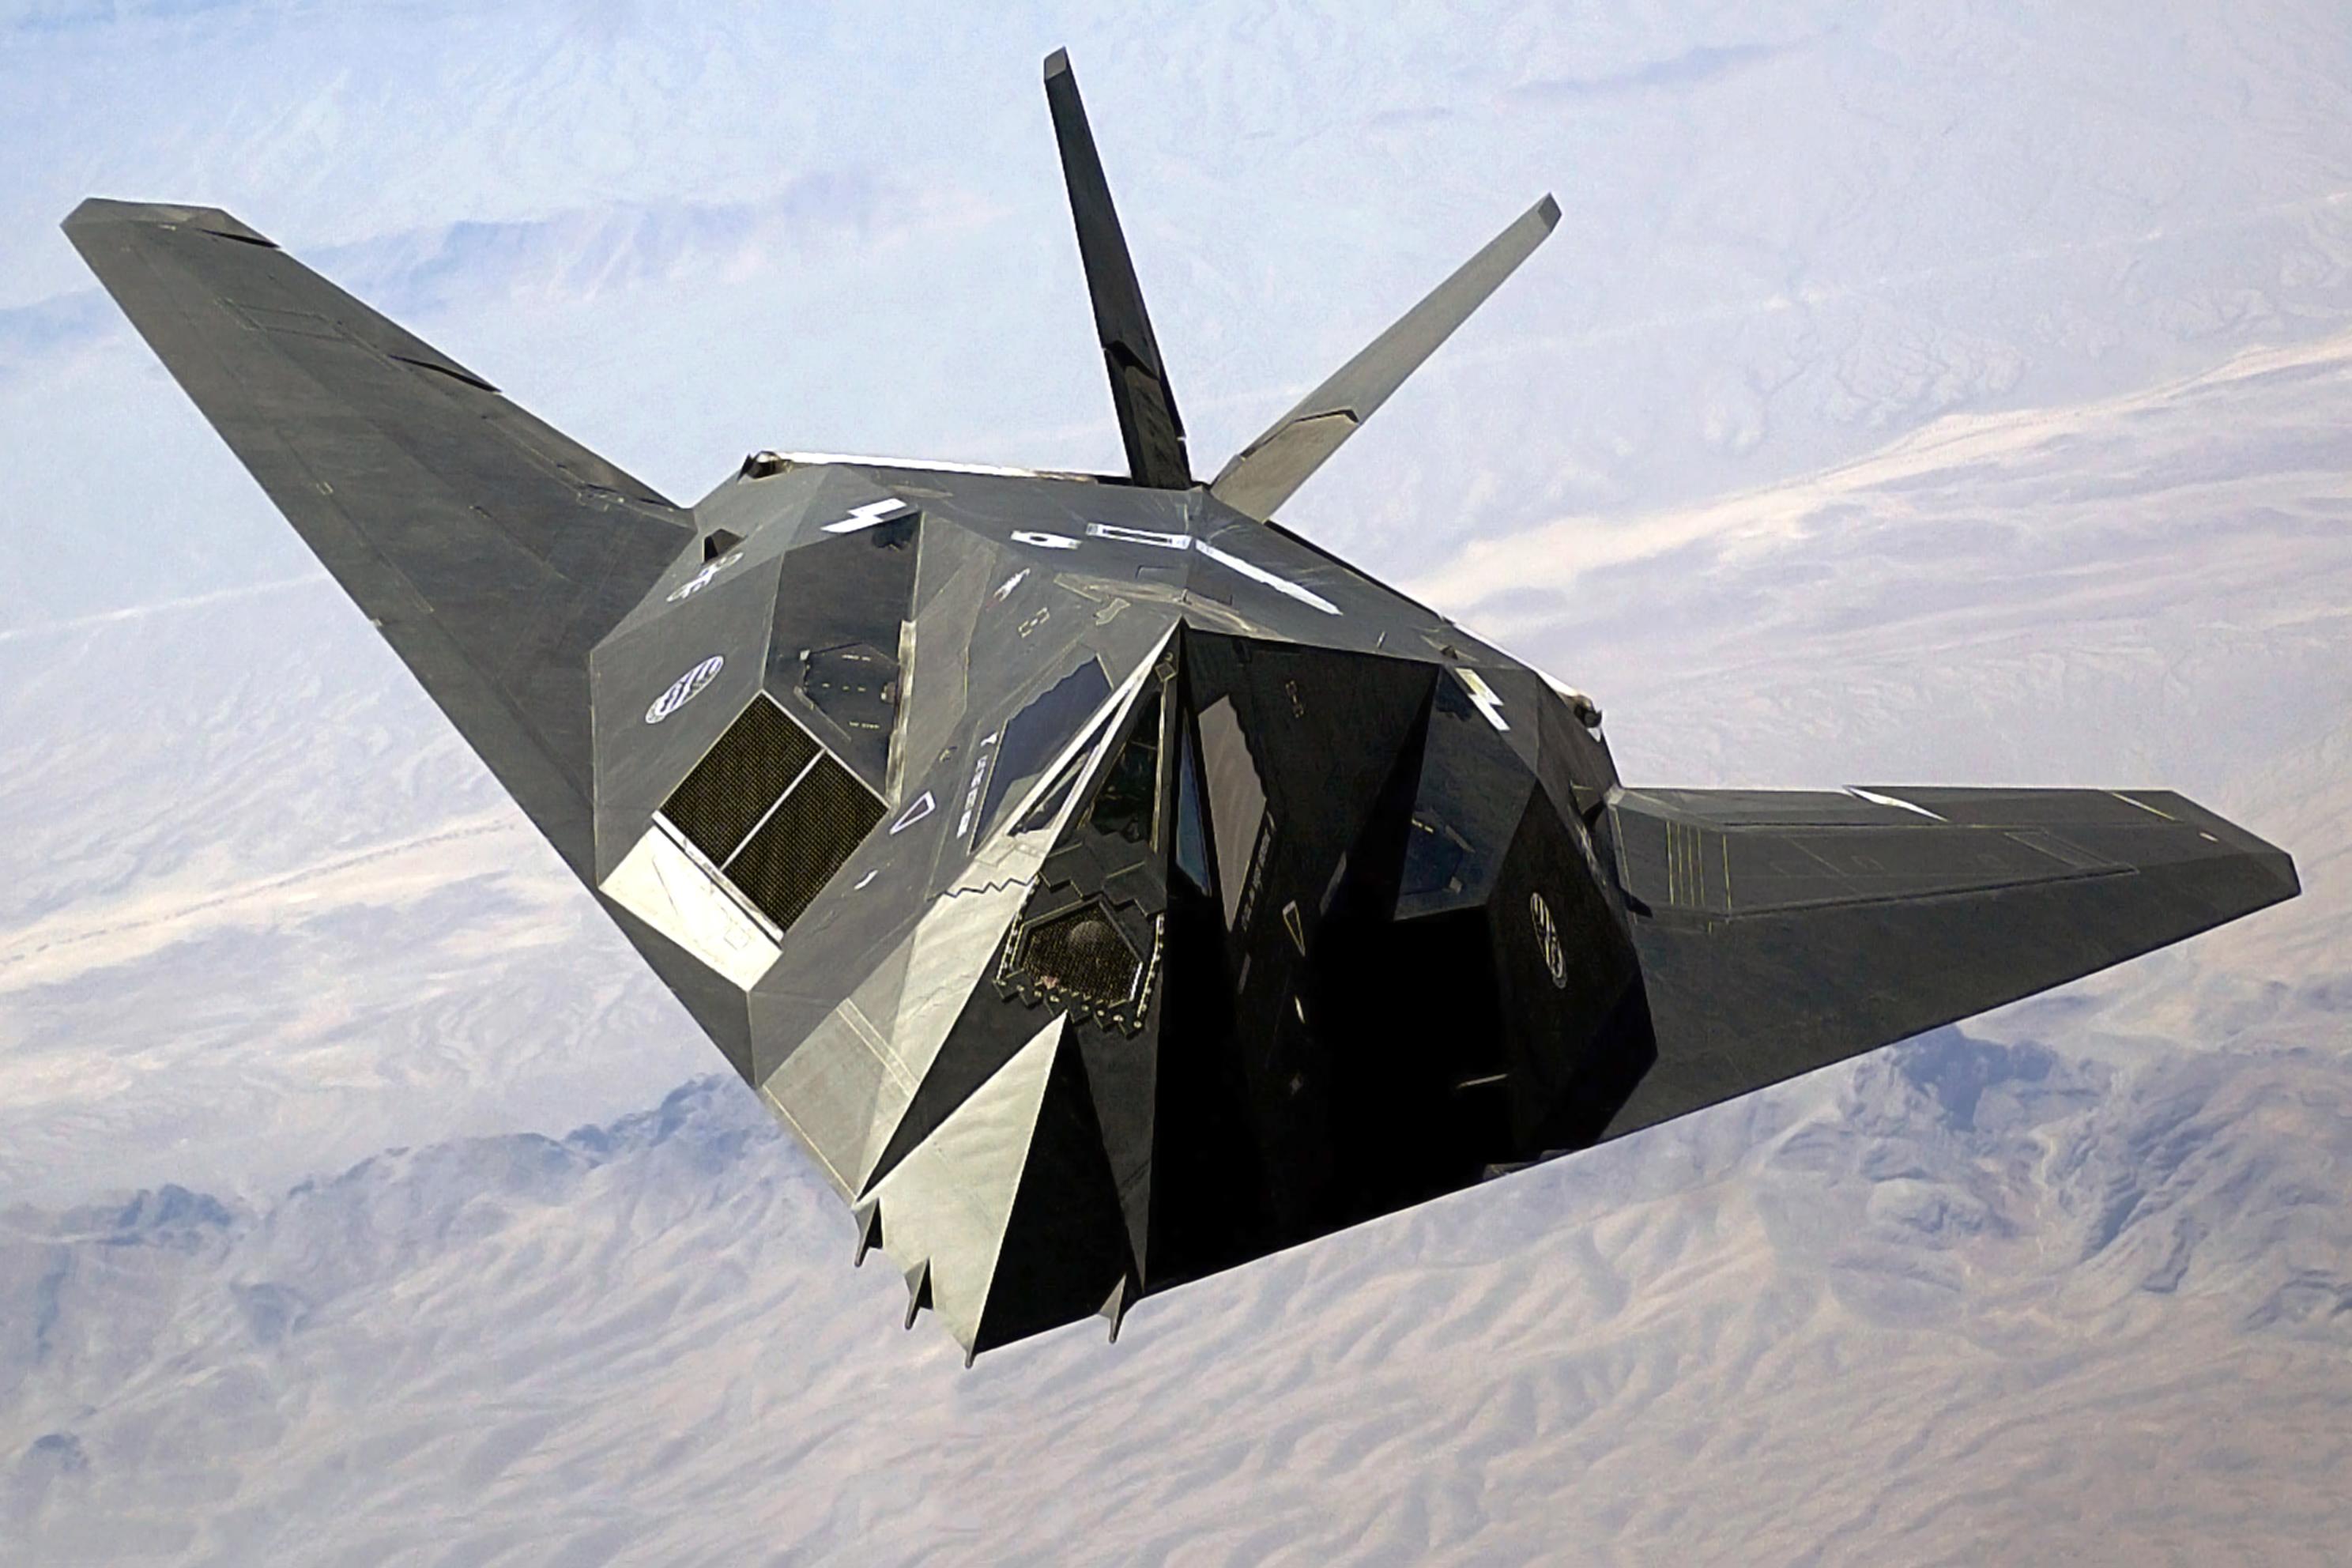 https://upload.wikimedia.org/wikipedia/commons/a/a1/F-117_Nighthawk_Front.jpg?uselang=ru